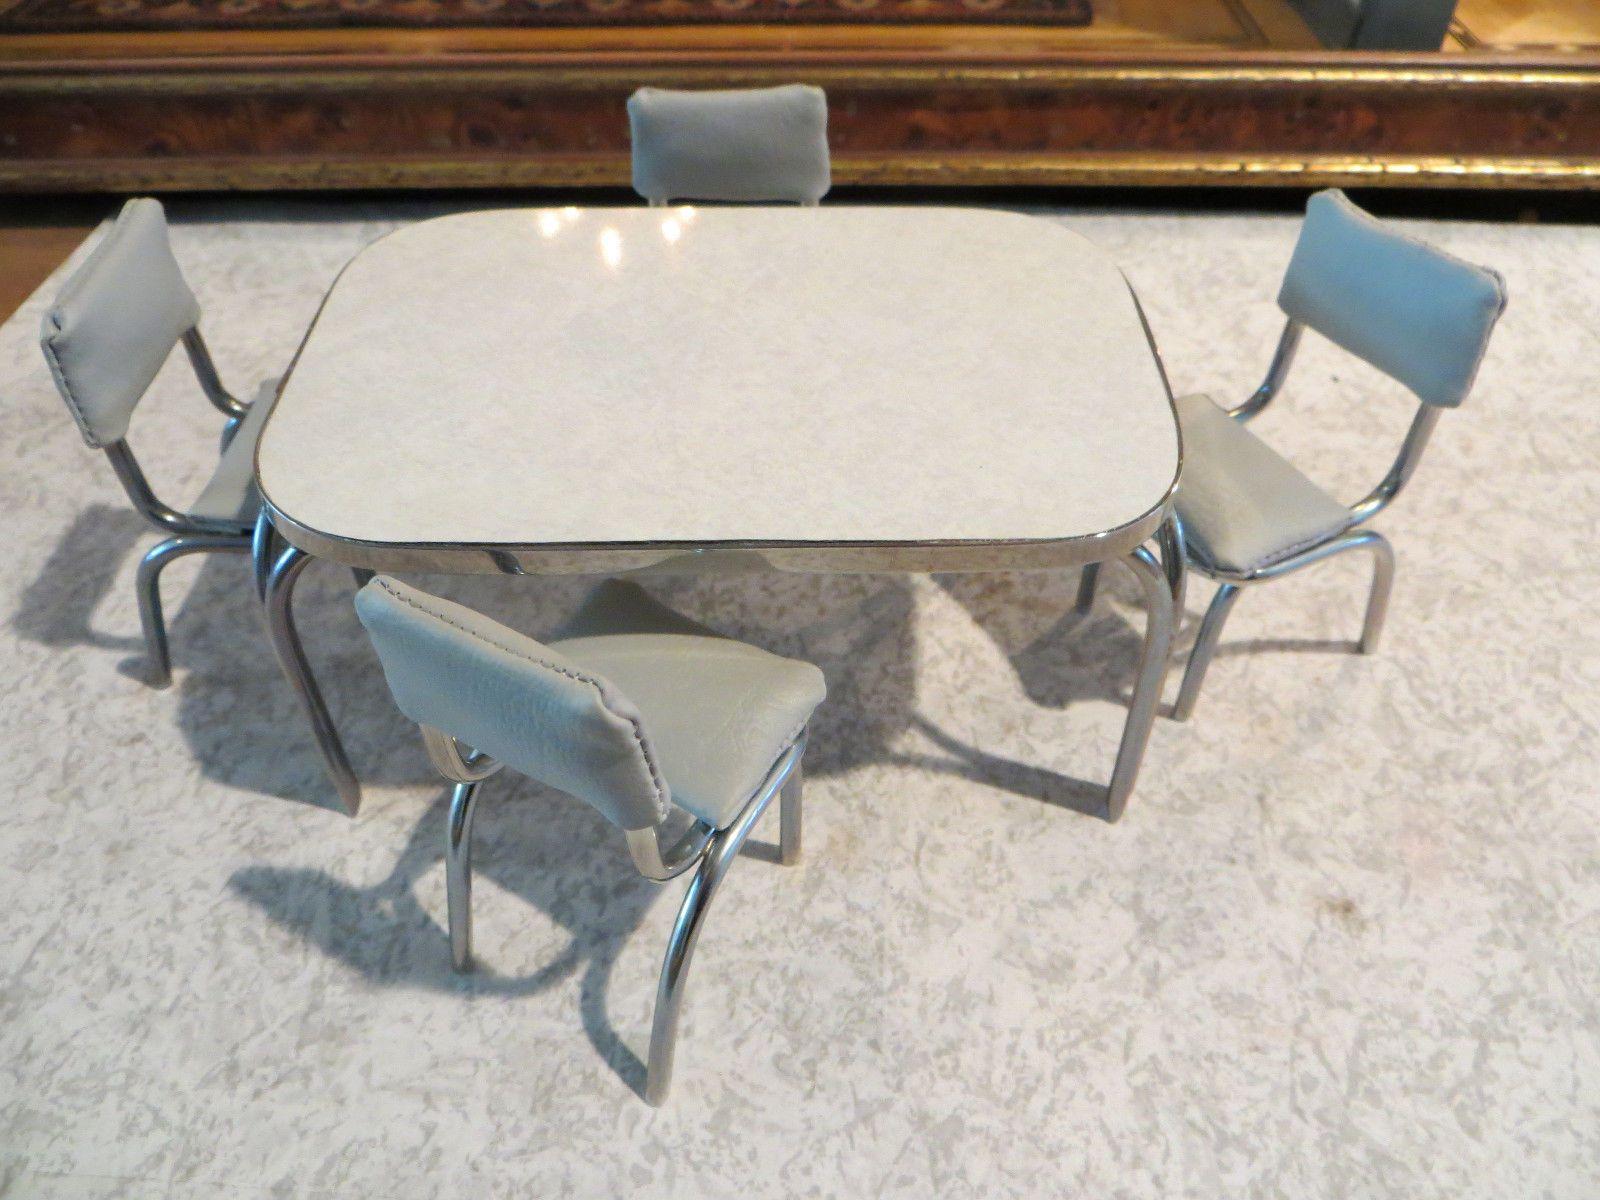 Miniature Artisan Signed Karen Fuller K J Metalworks Table and